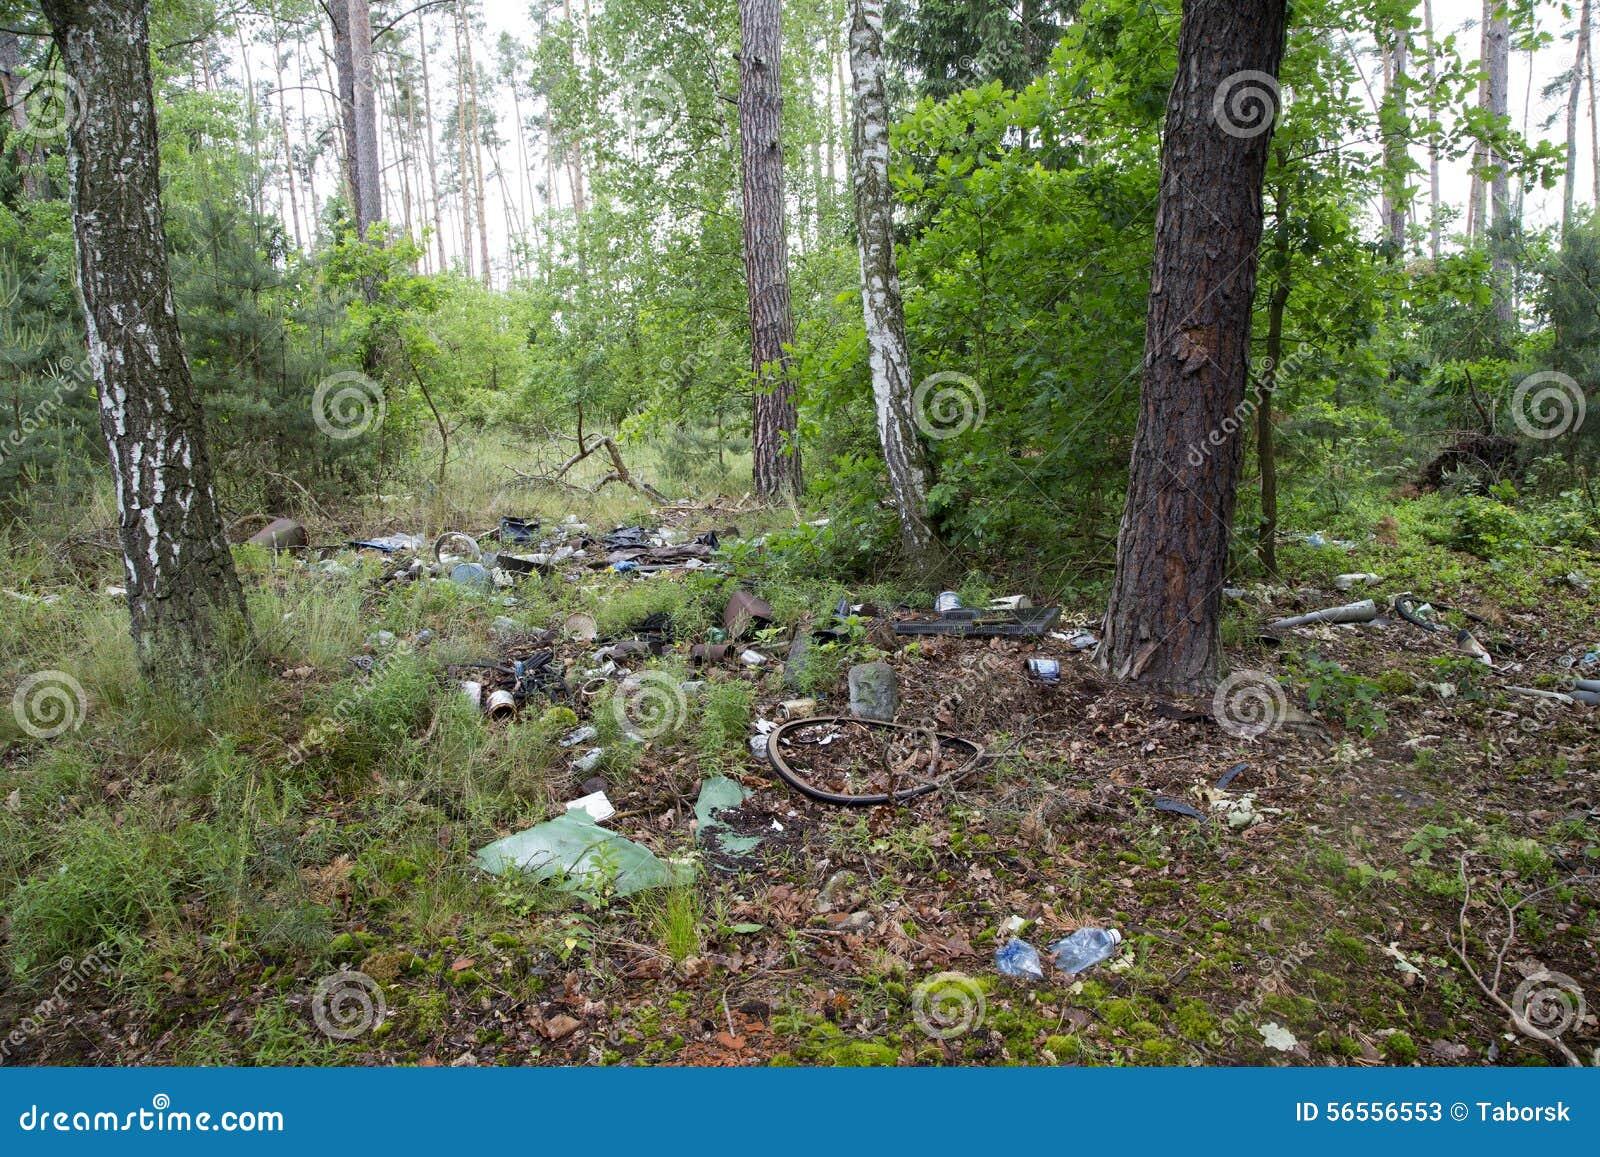 Download Σκουπίδια στο δάσος στοκ εικόνα. εικόνα από κύρωση, πλαστικό - 56556553